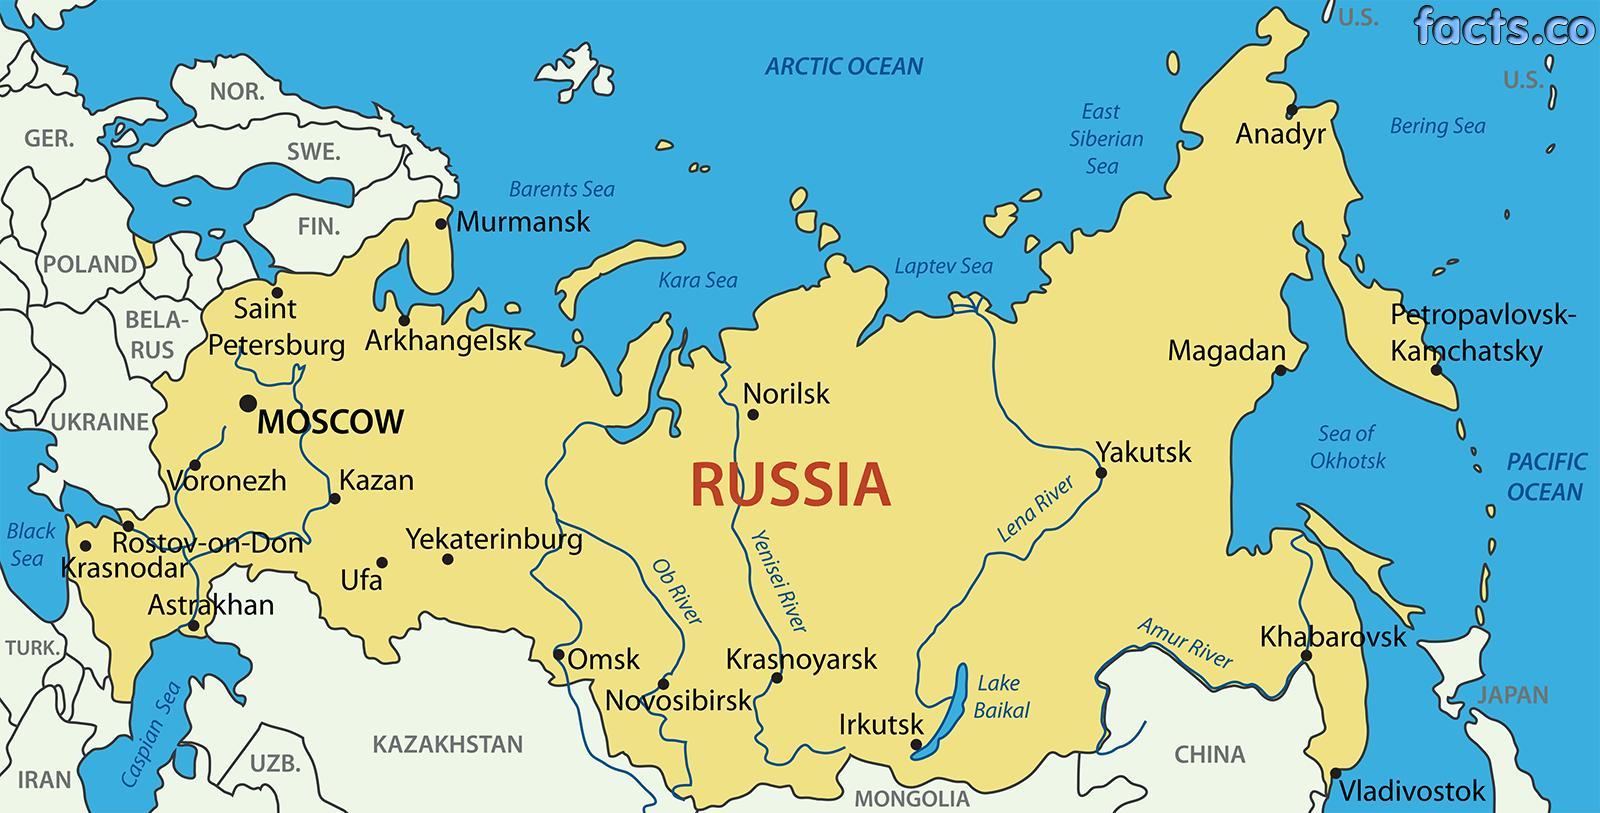 Ciudades De Rusia Mapa.Rusia Mapa De Las Ciudades De Las Ciudades De Rusia Mapa